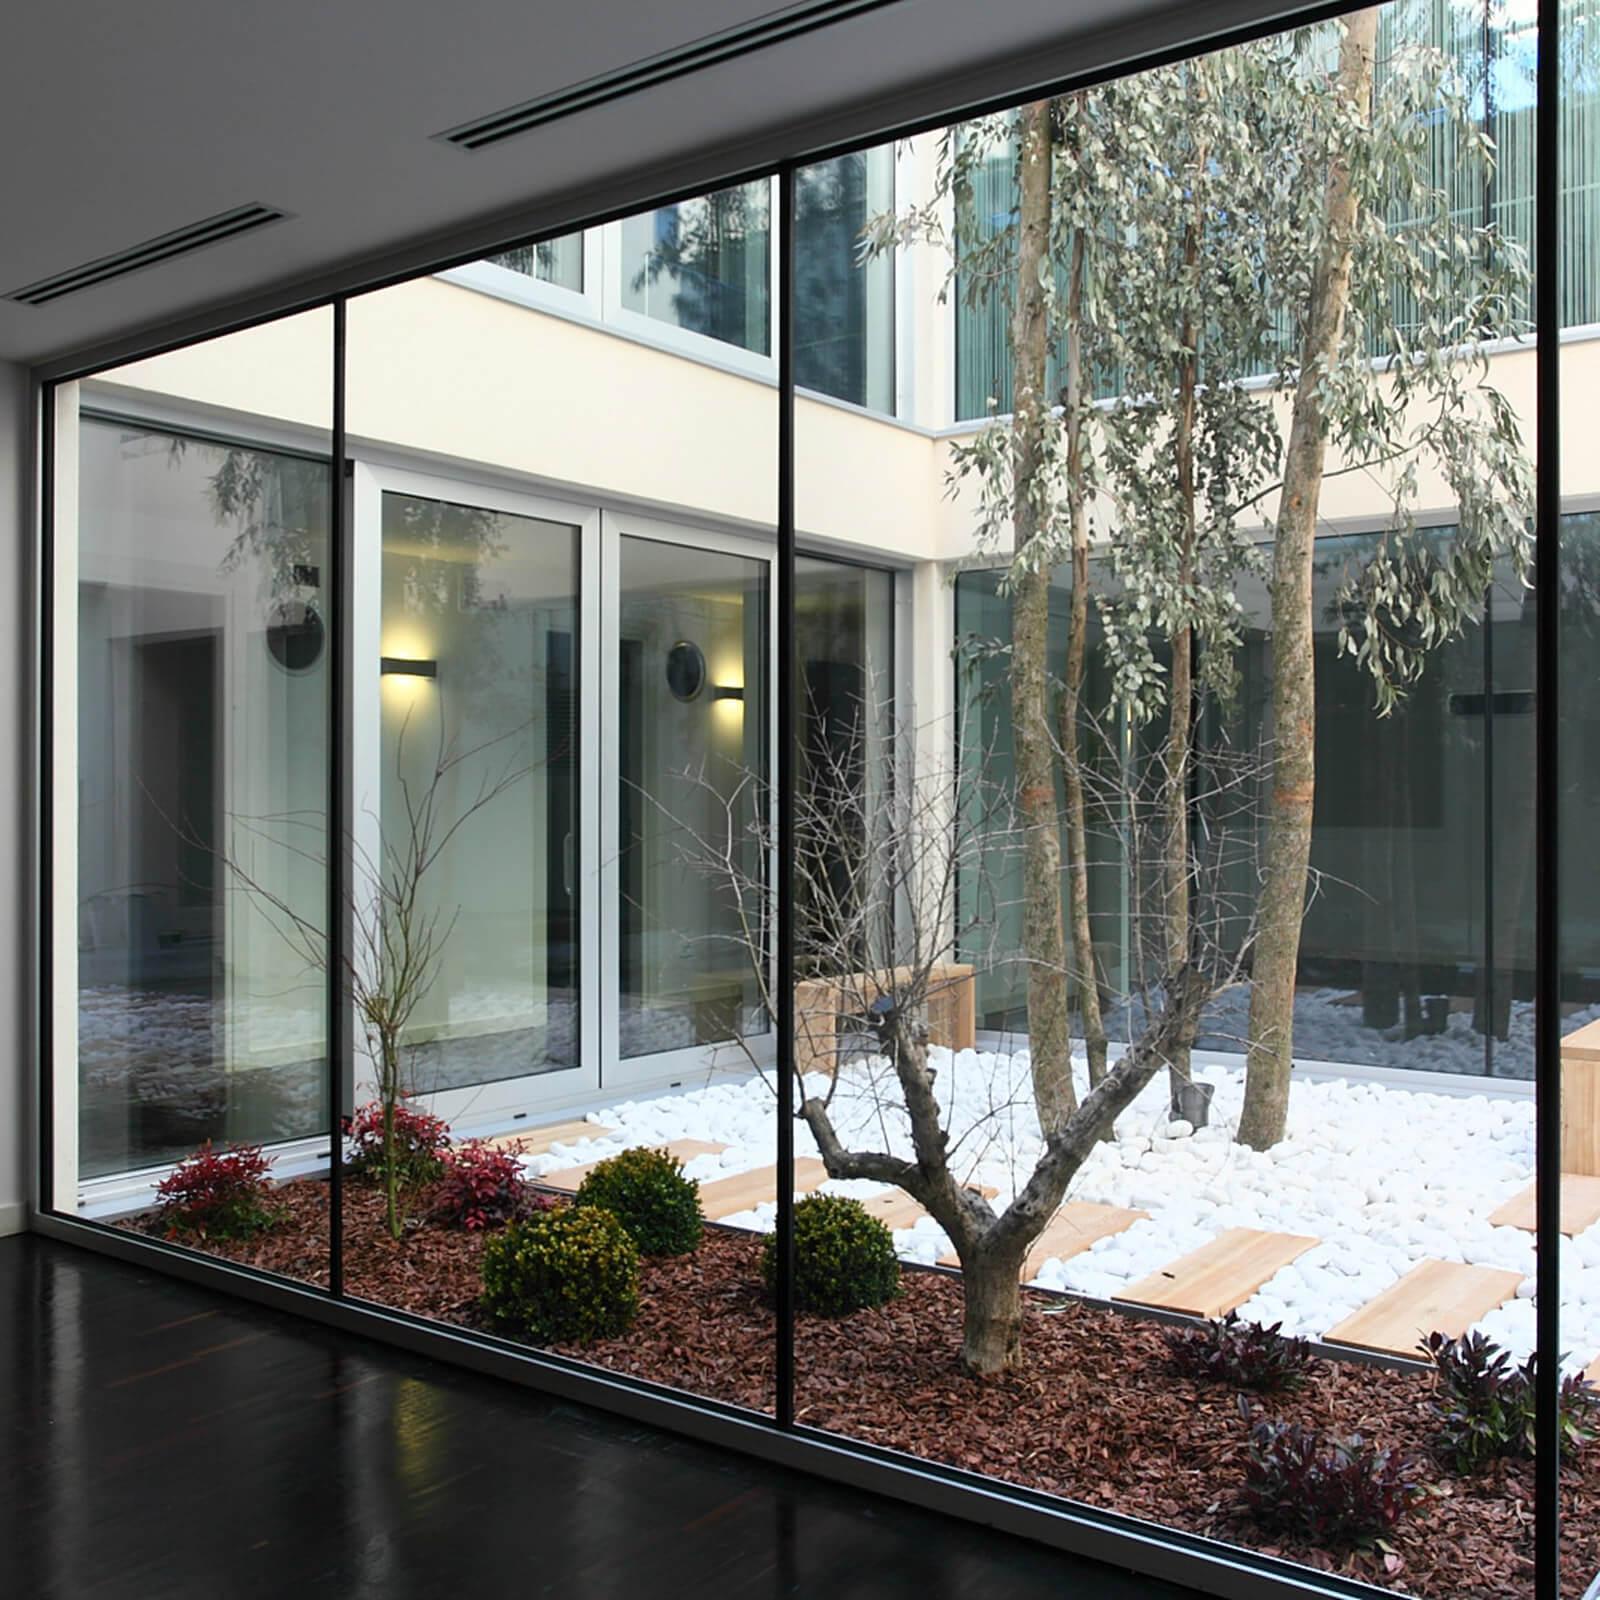 blu-moret-wellness-spa-centro-benessere-udine-giardino-interno-spa2